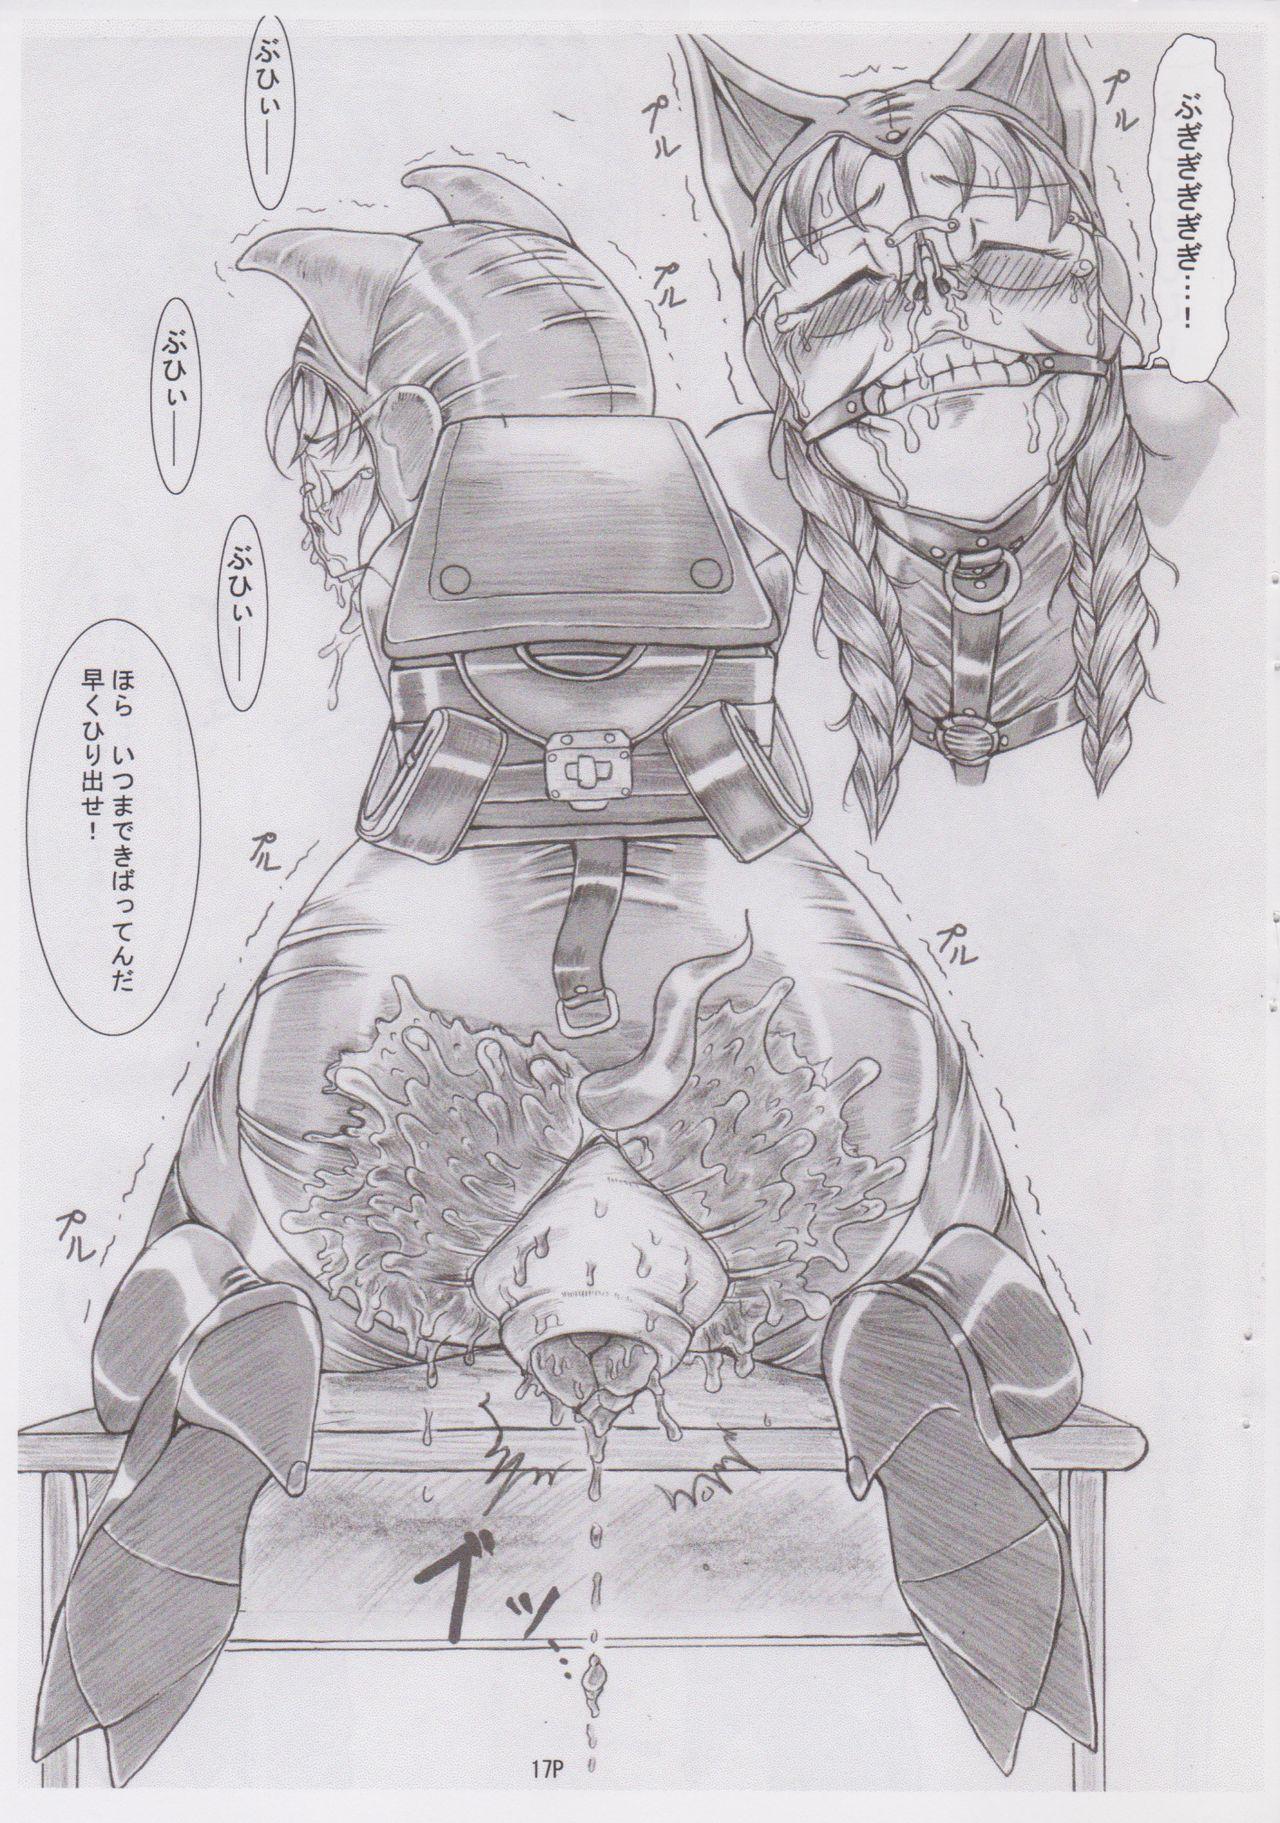 (C78) [Nekoneko Panchu! (Nekoneko Panchu)] Sanshimai Choukyou Yuugi [Yukari Hen] Yukari-chan no Butabana Kachiku Choukyou [Anal Higyaku Jugyou] 16